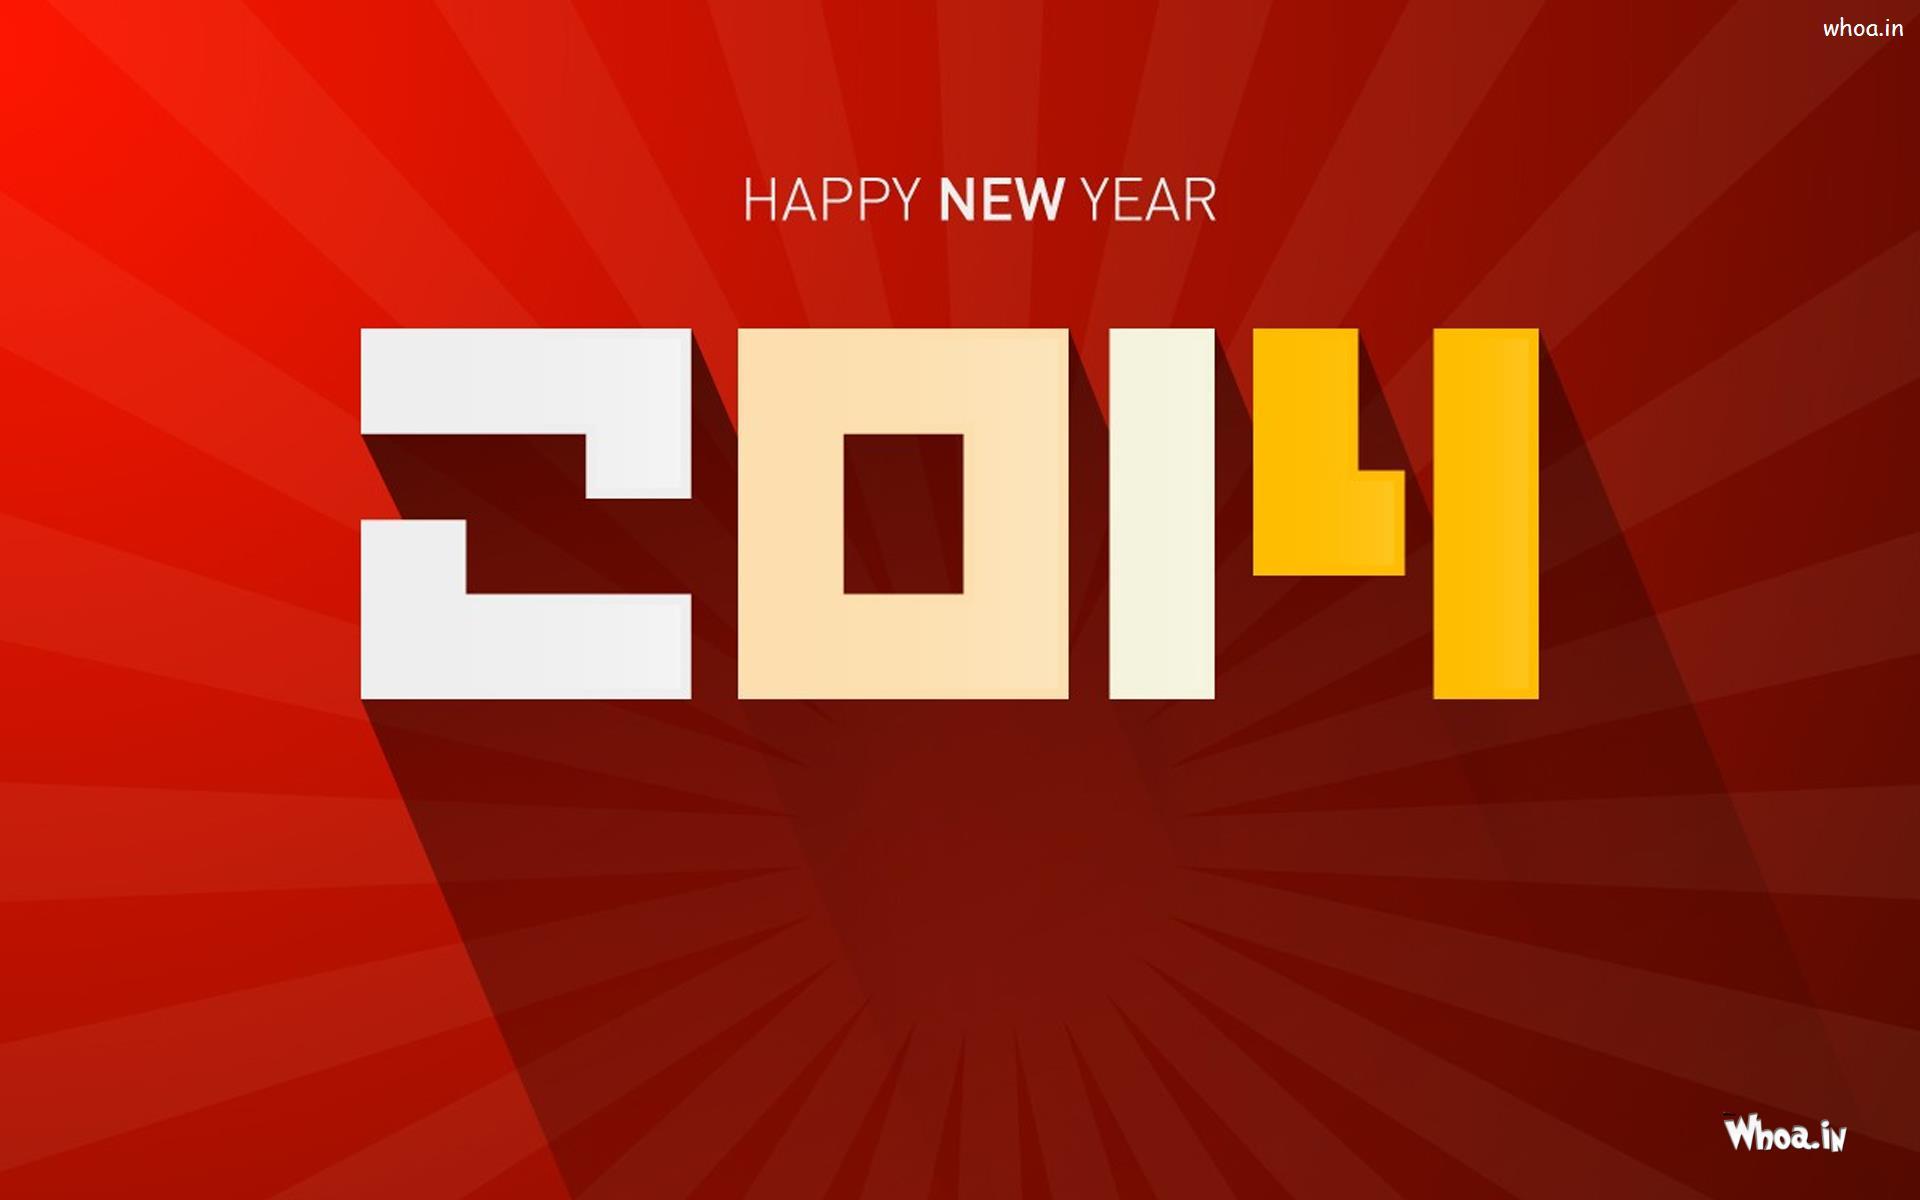 happy new year 2014 hd wallpaper #5